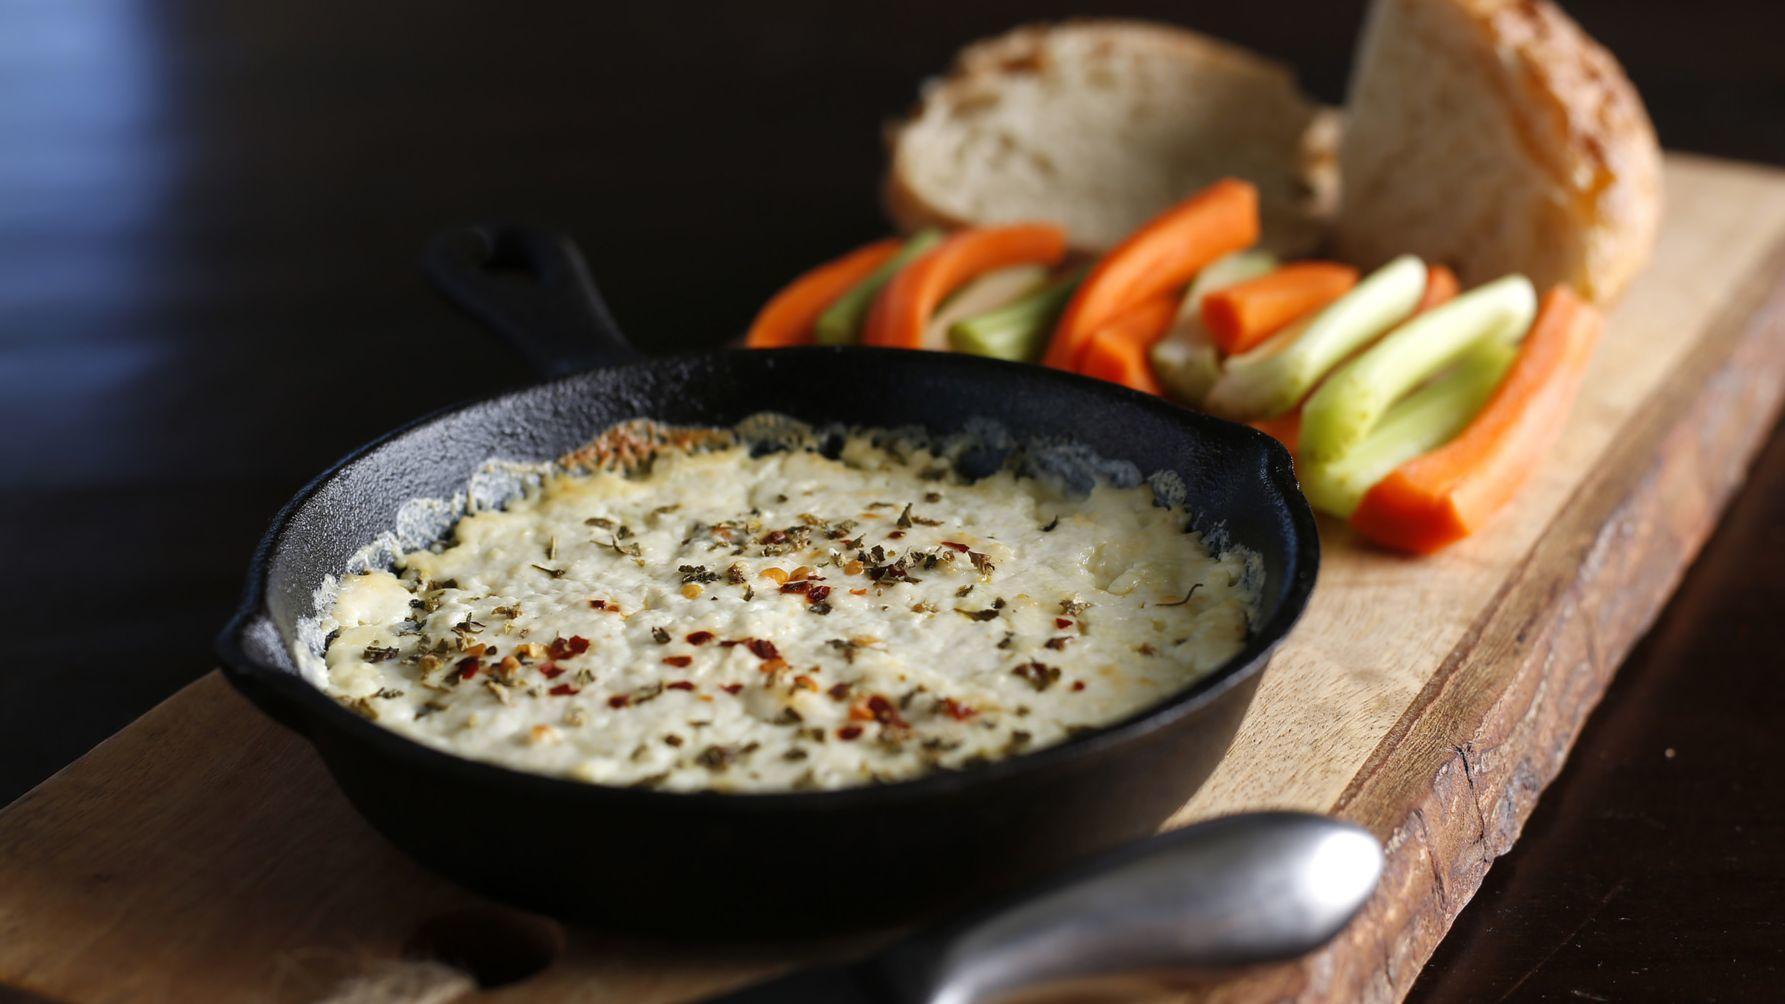 Easy homemade cheeses: ricotta and mozzarella